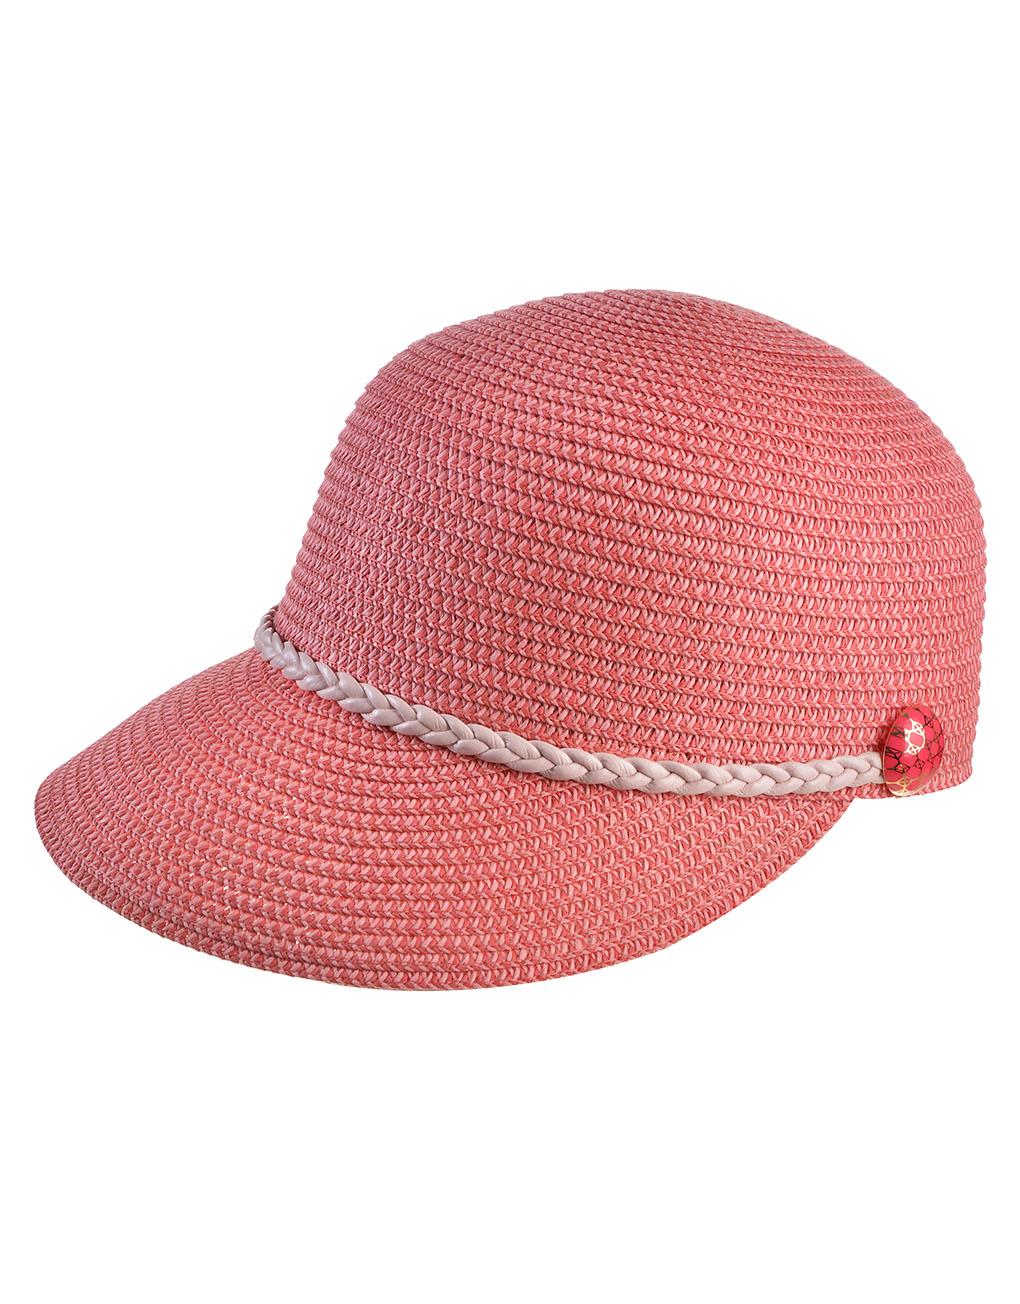 Buy Straw Hats Wholesale ee9dcba042d